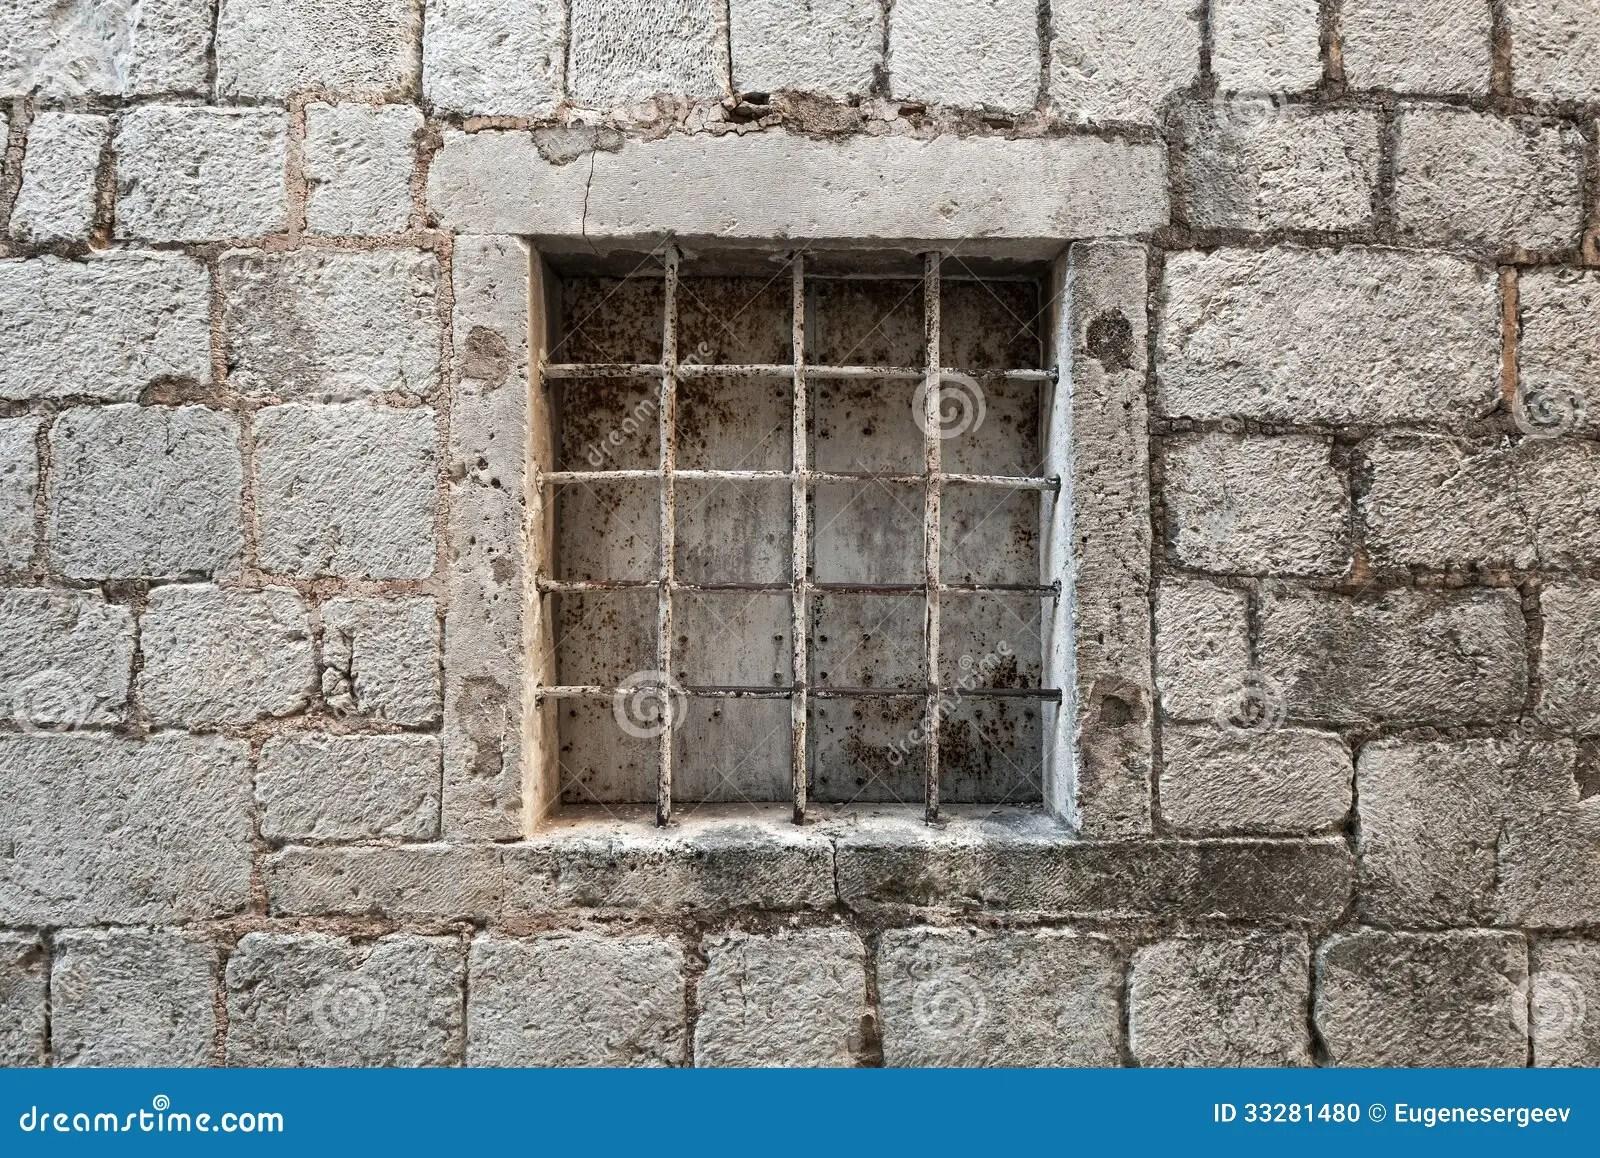 Prison Wall With Metal Window Bars Stock Photo